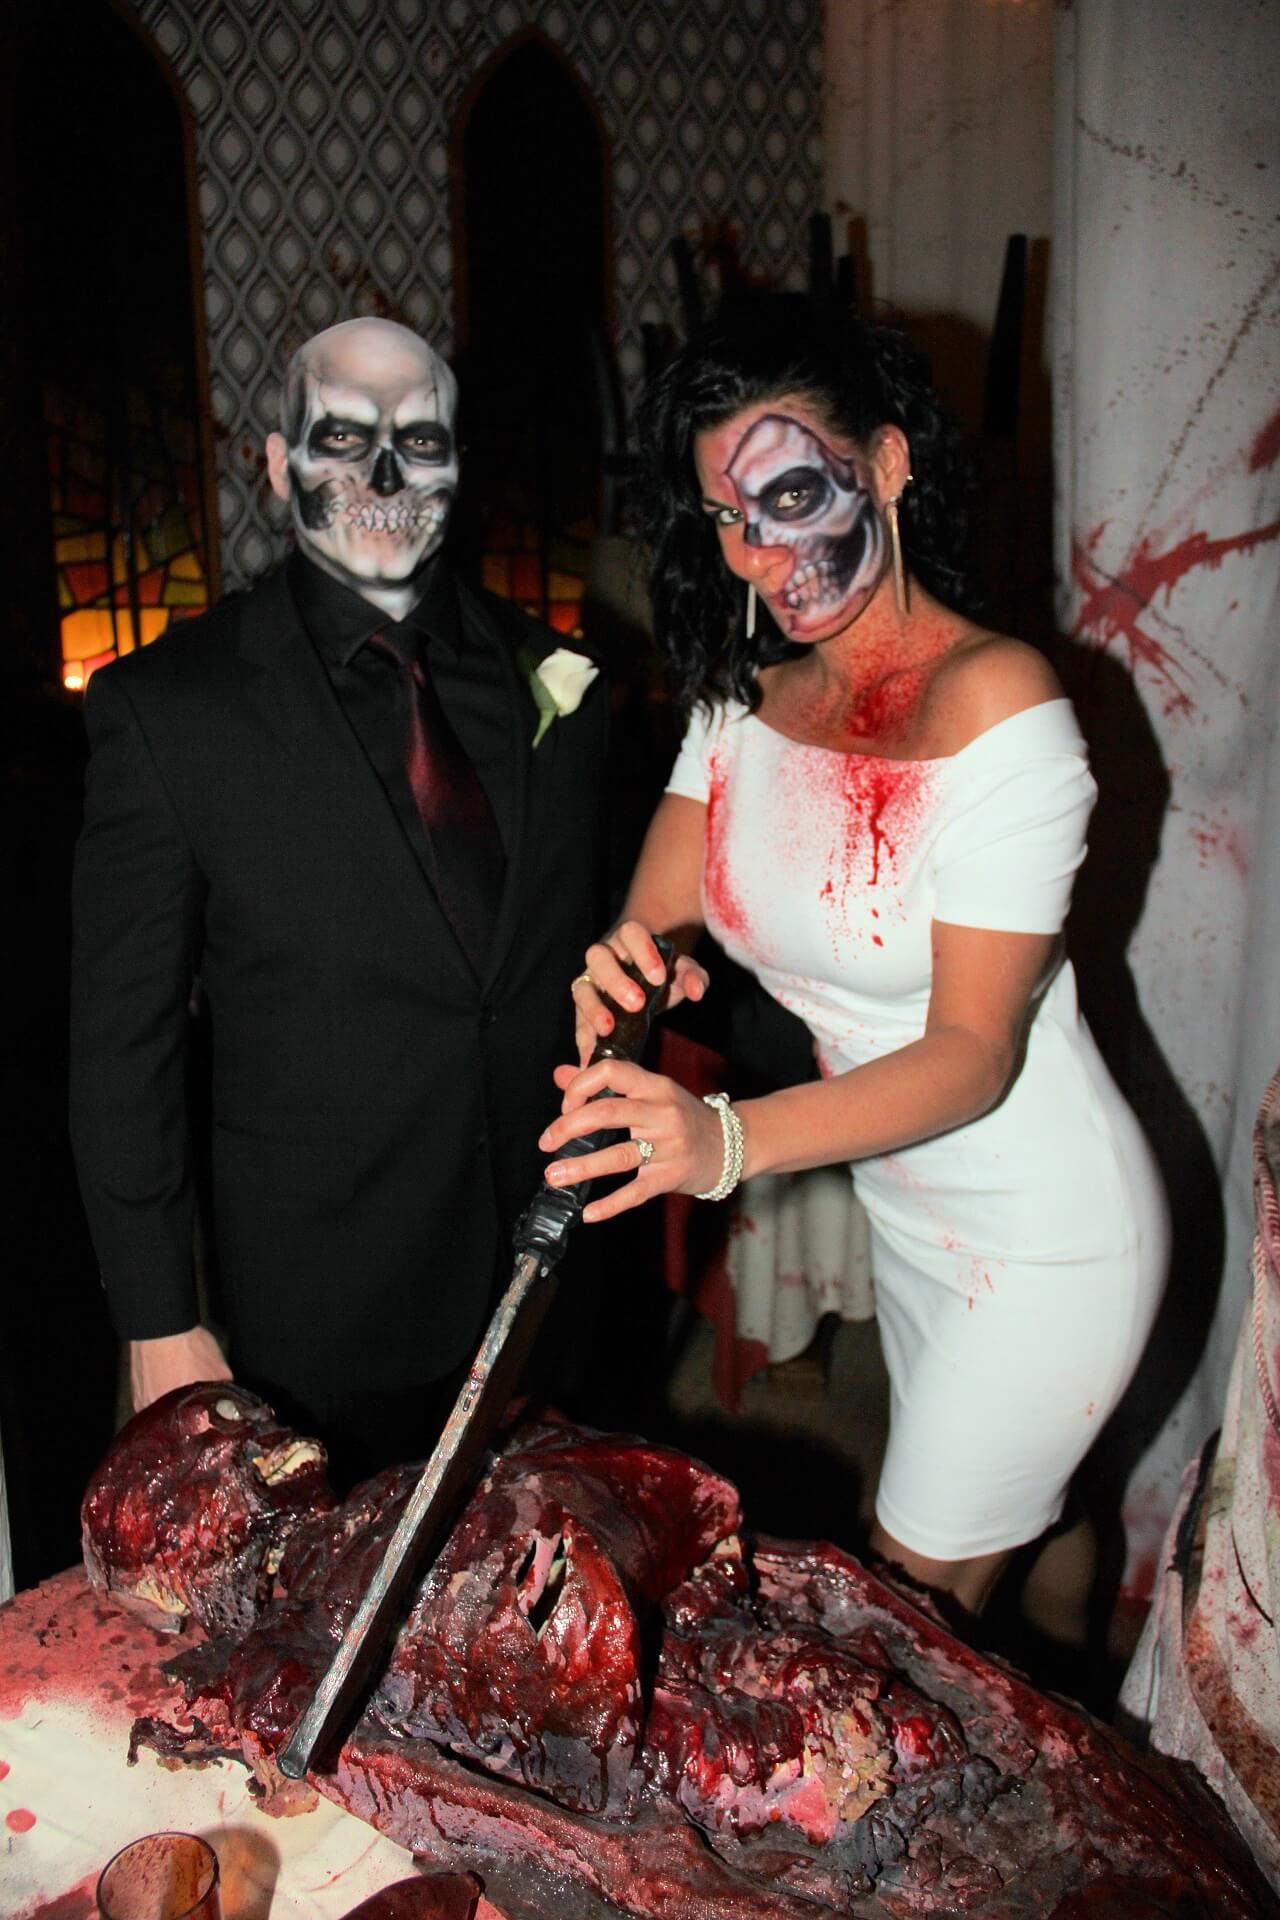 Halloween Ghoulish Photo -4